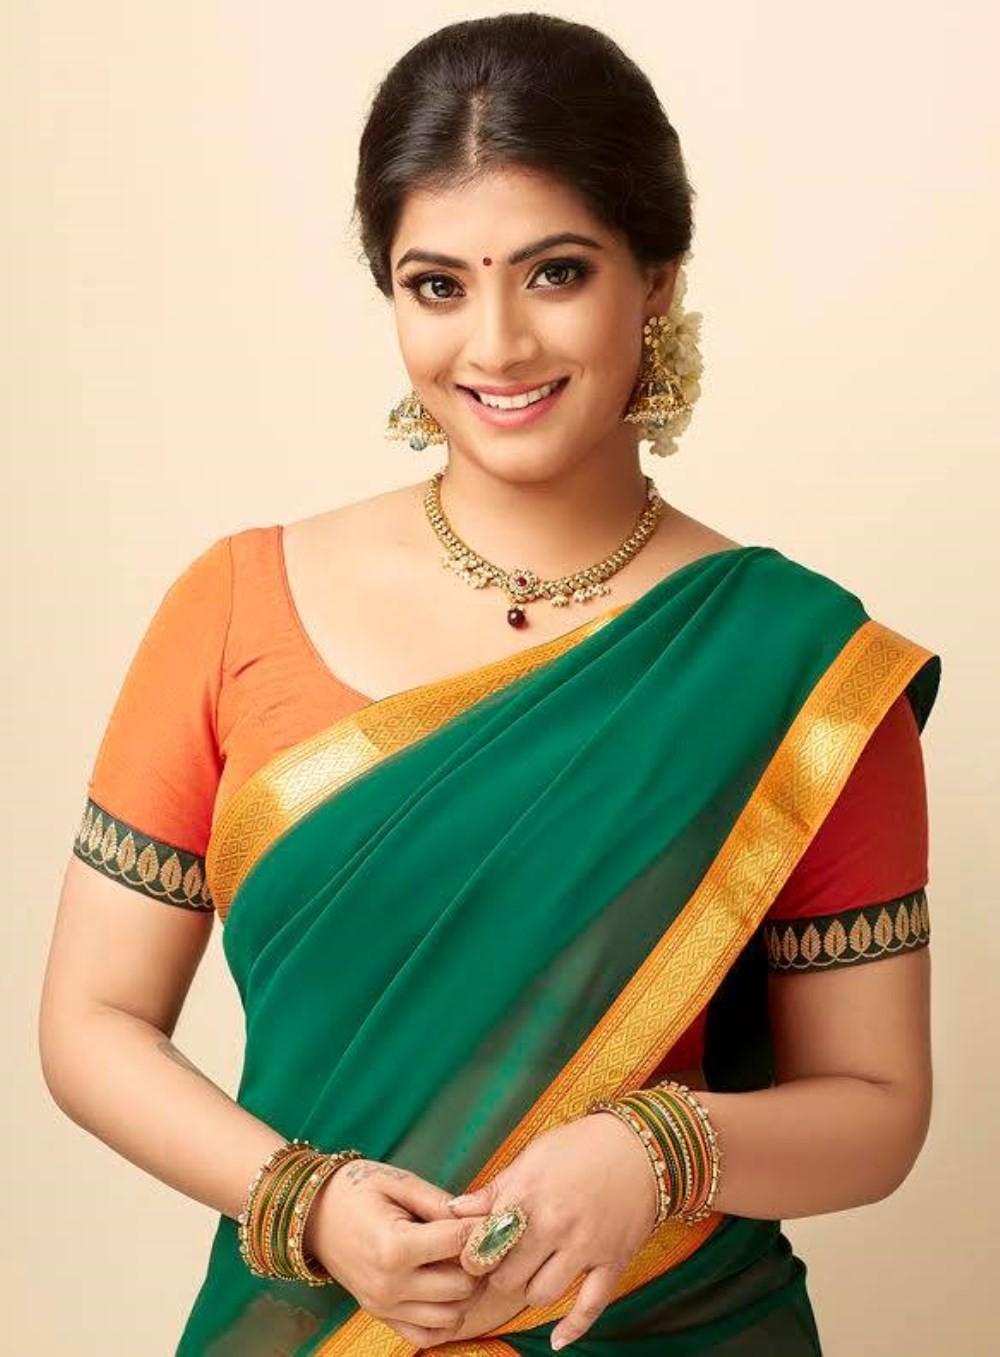 Forum on this topic: Lisa Kay, varalaxmi-sarathkumar/